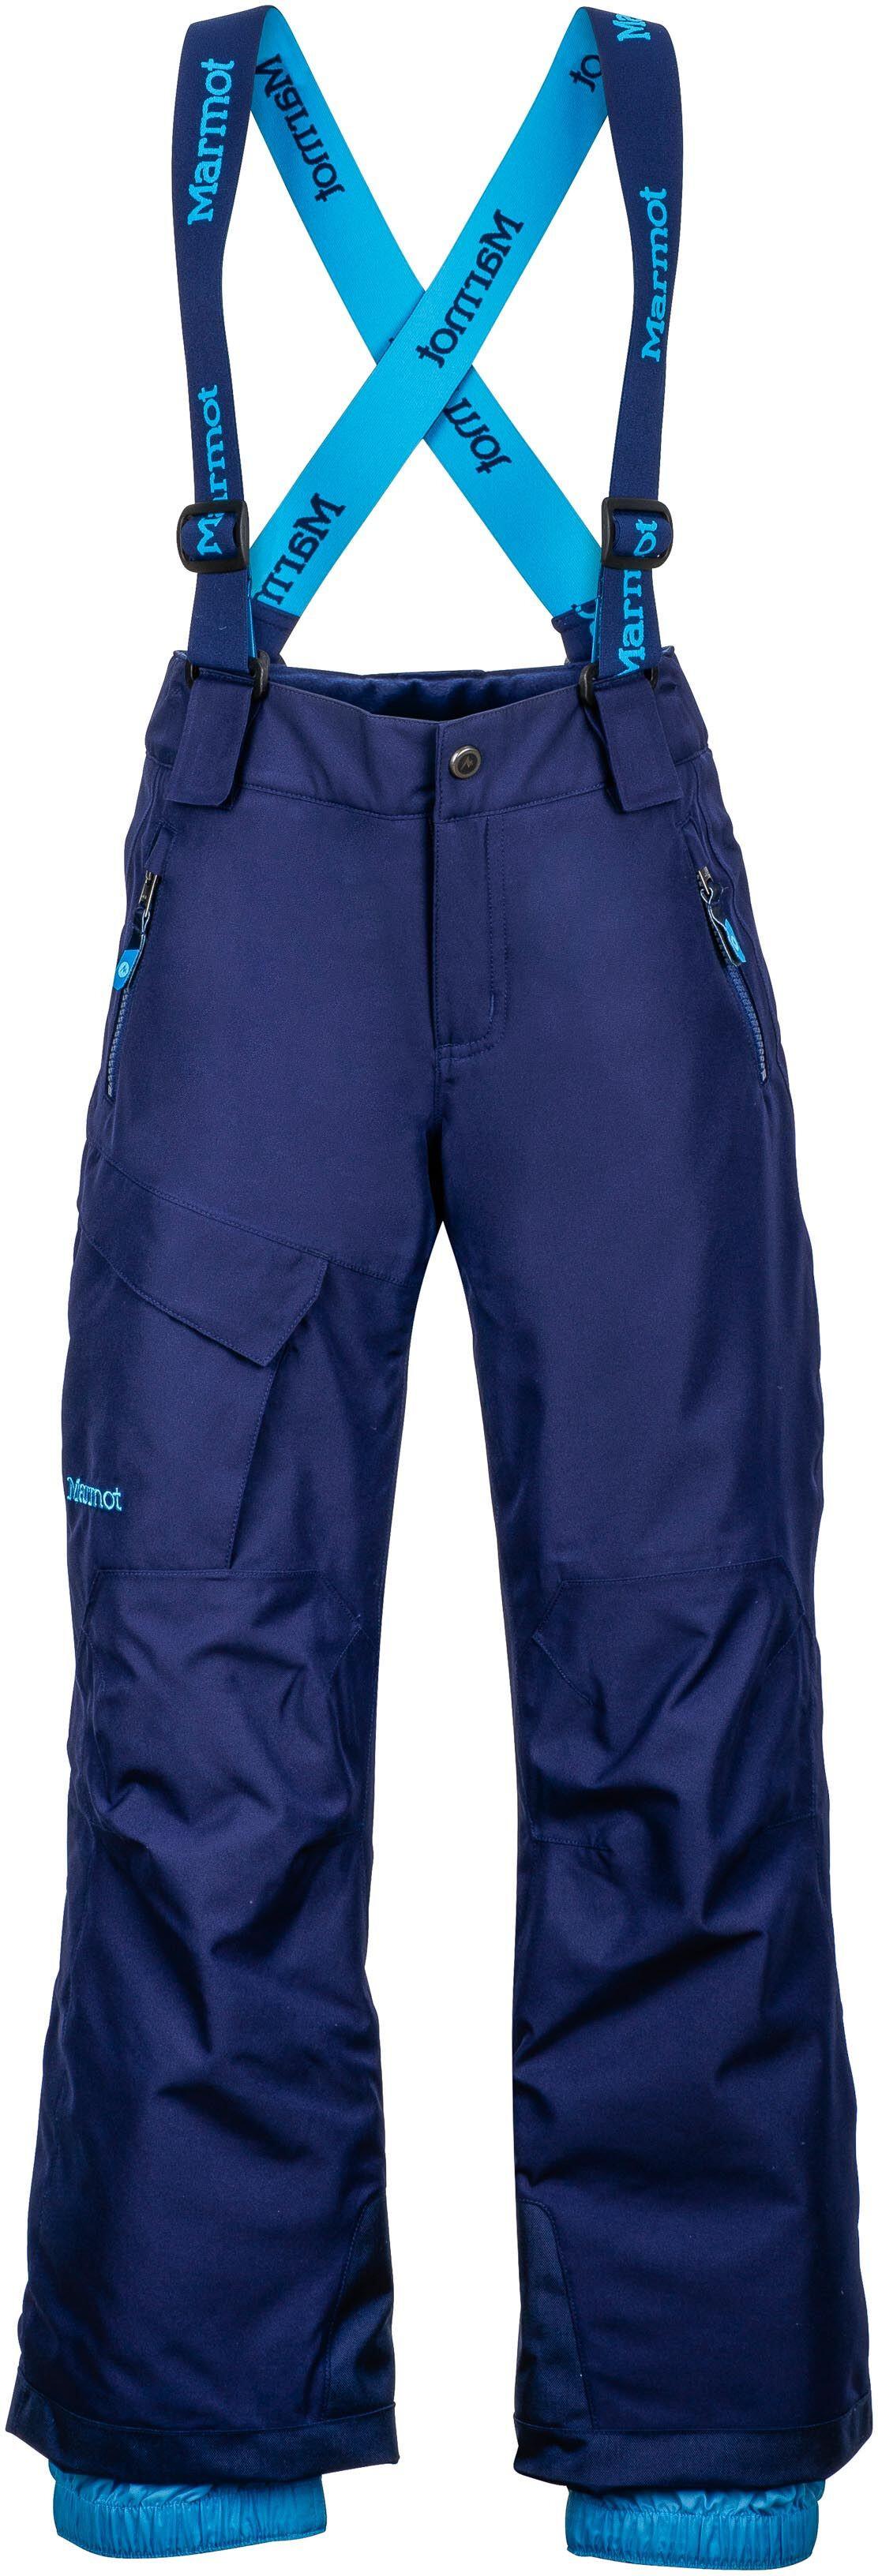 17d7dcc5 Marmot Boys Edge Insulated Pants Arctic Navy | Gode tilbud hos ...